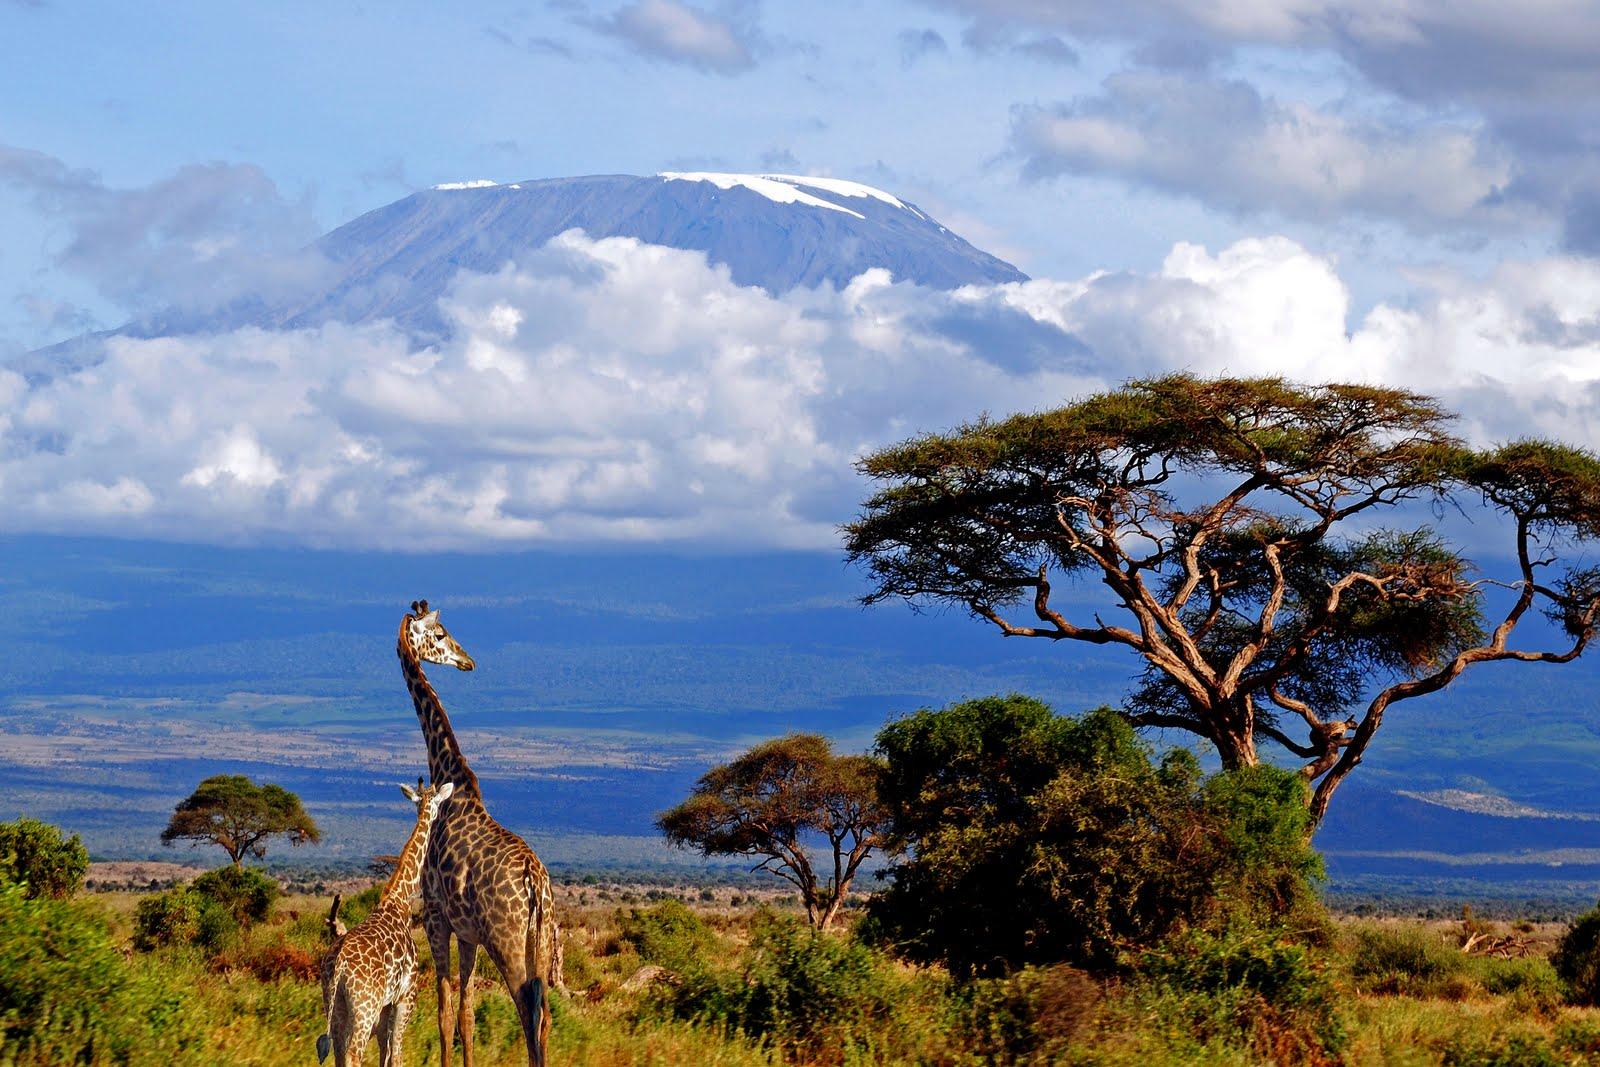 kilimanjaro-giraffe-Tanzania